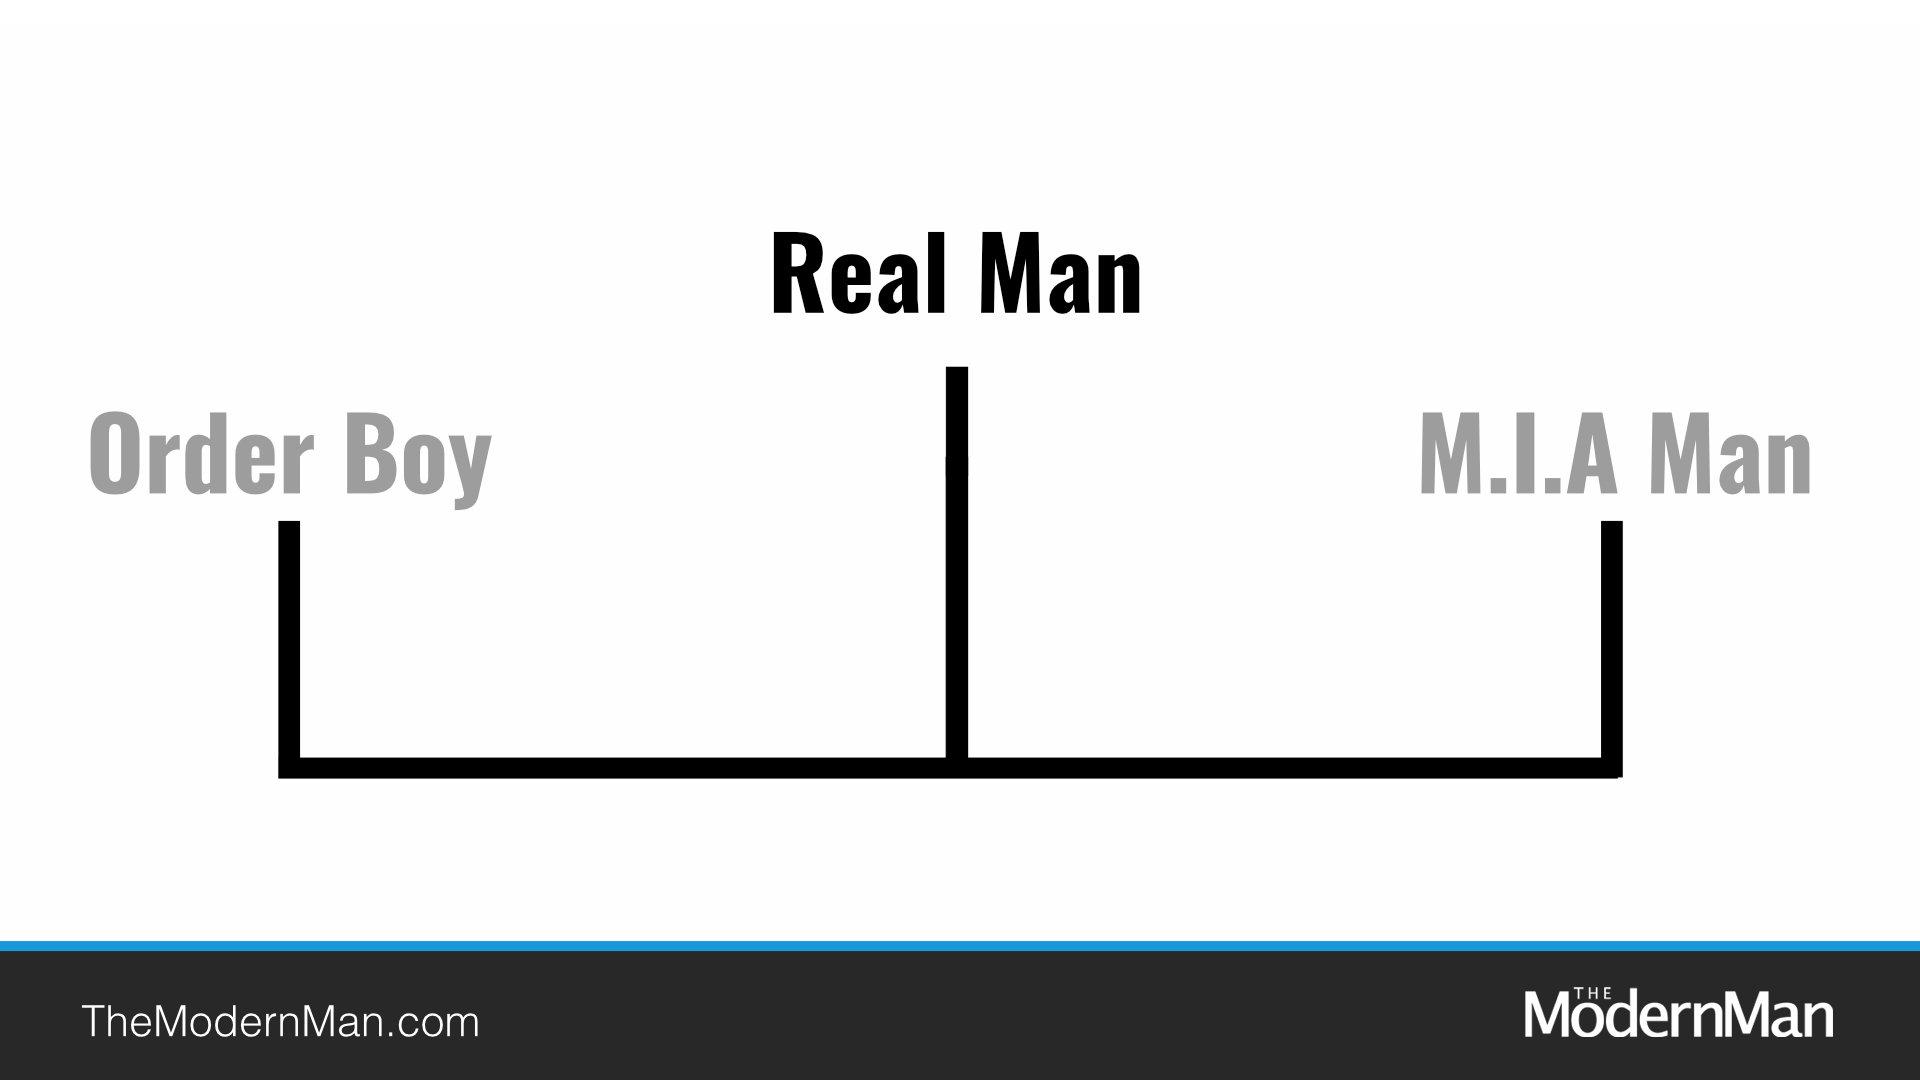 Don't be an Order Boy or an MIA Man